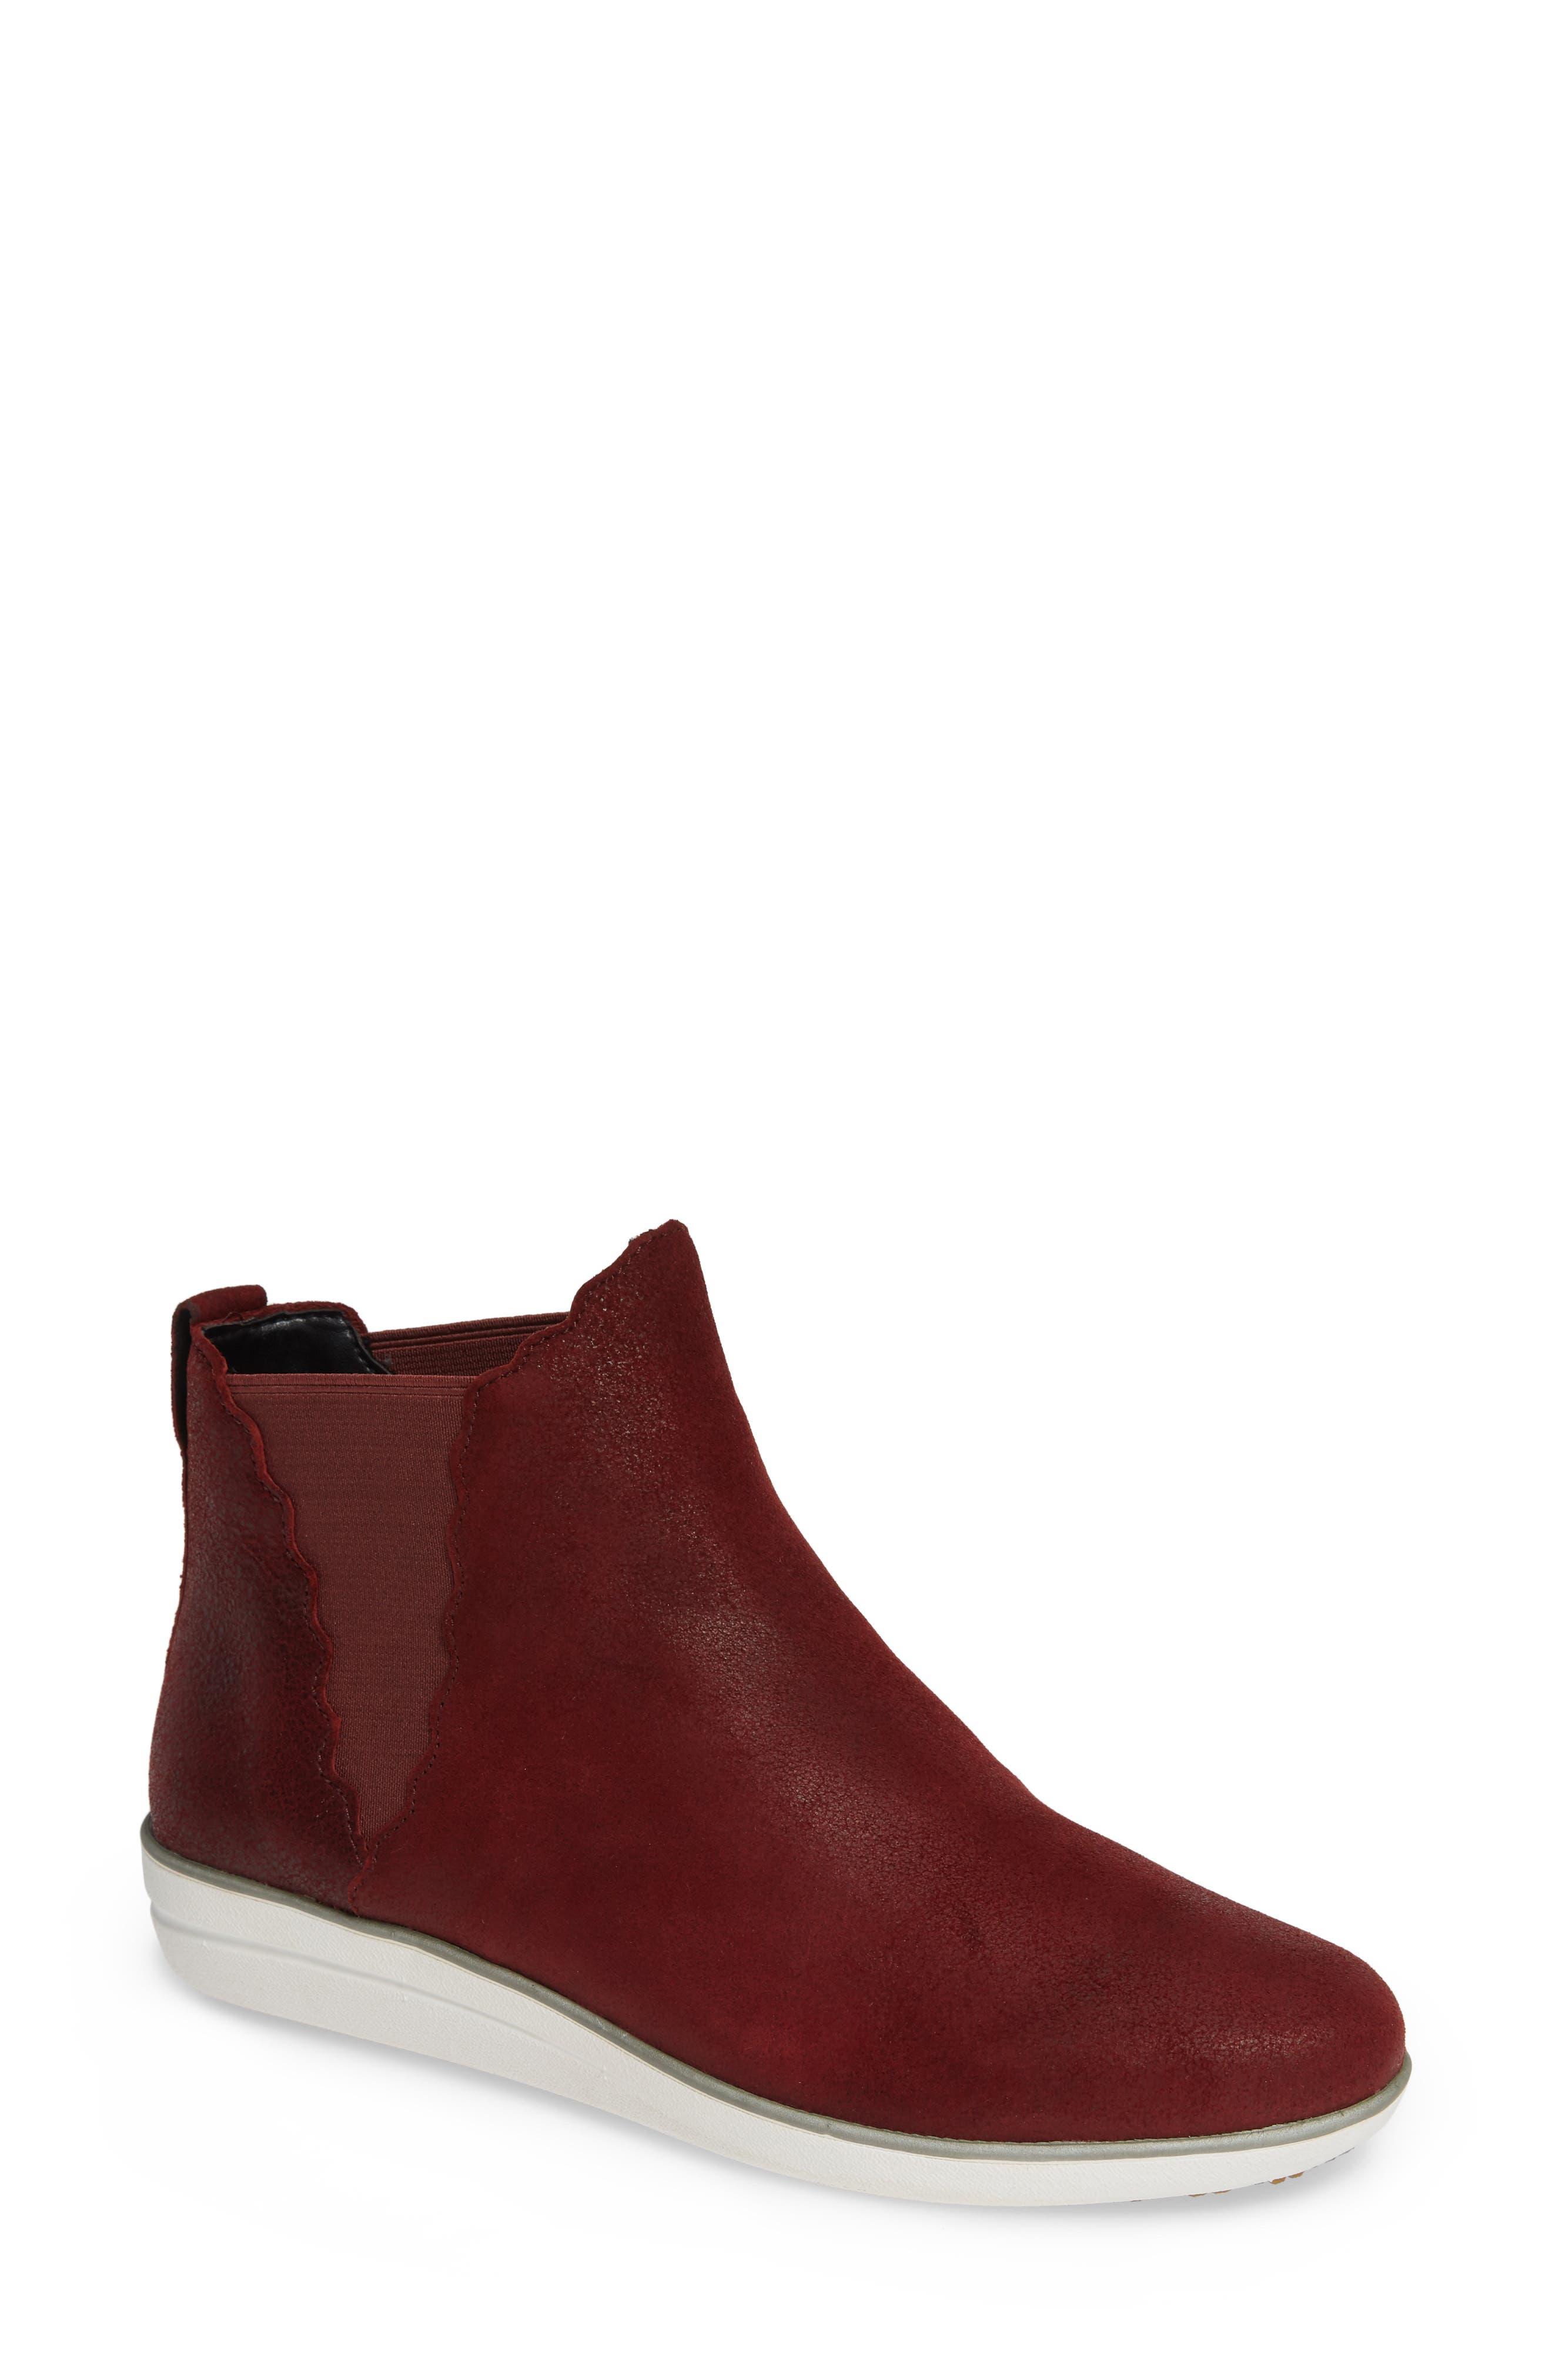 Aetrex Alanna Slip-On High Top Sneaker, Red